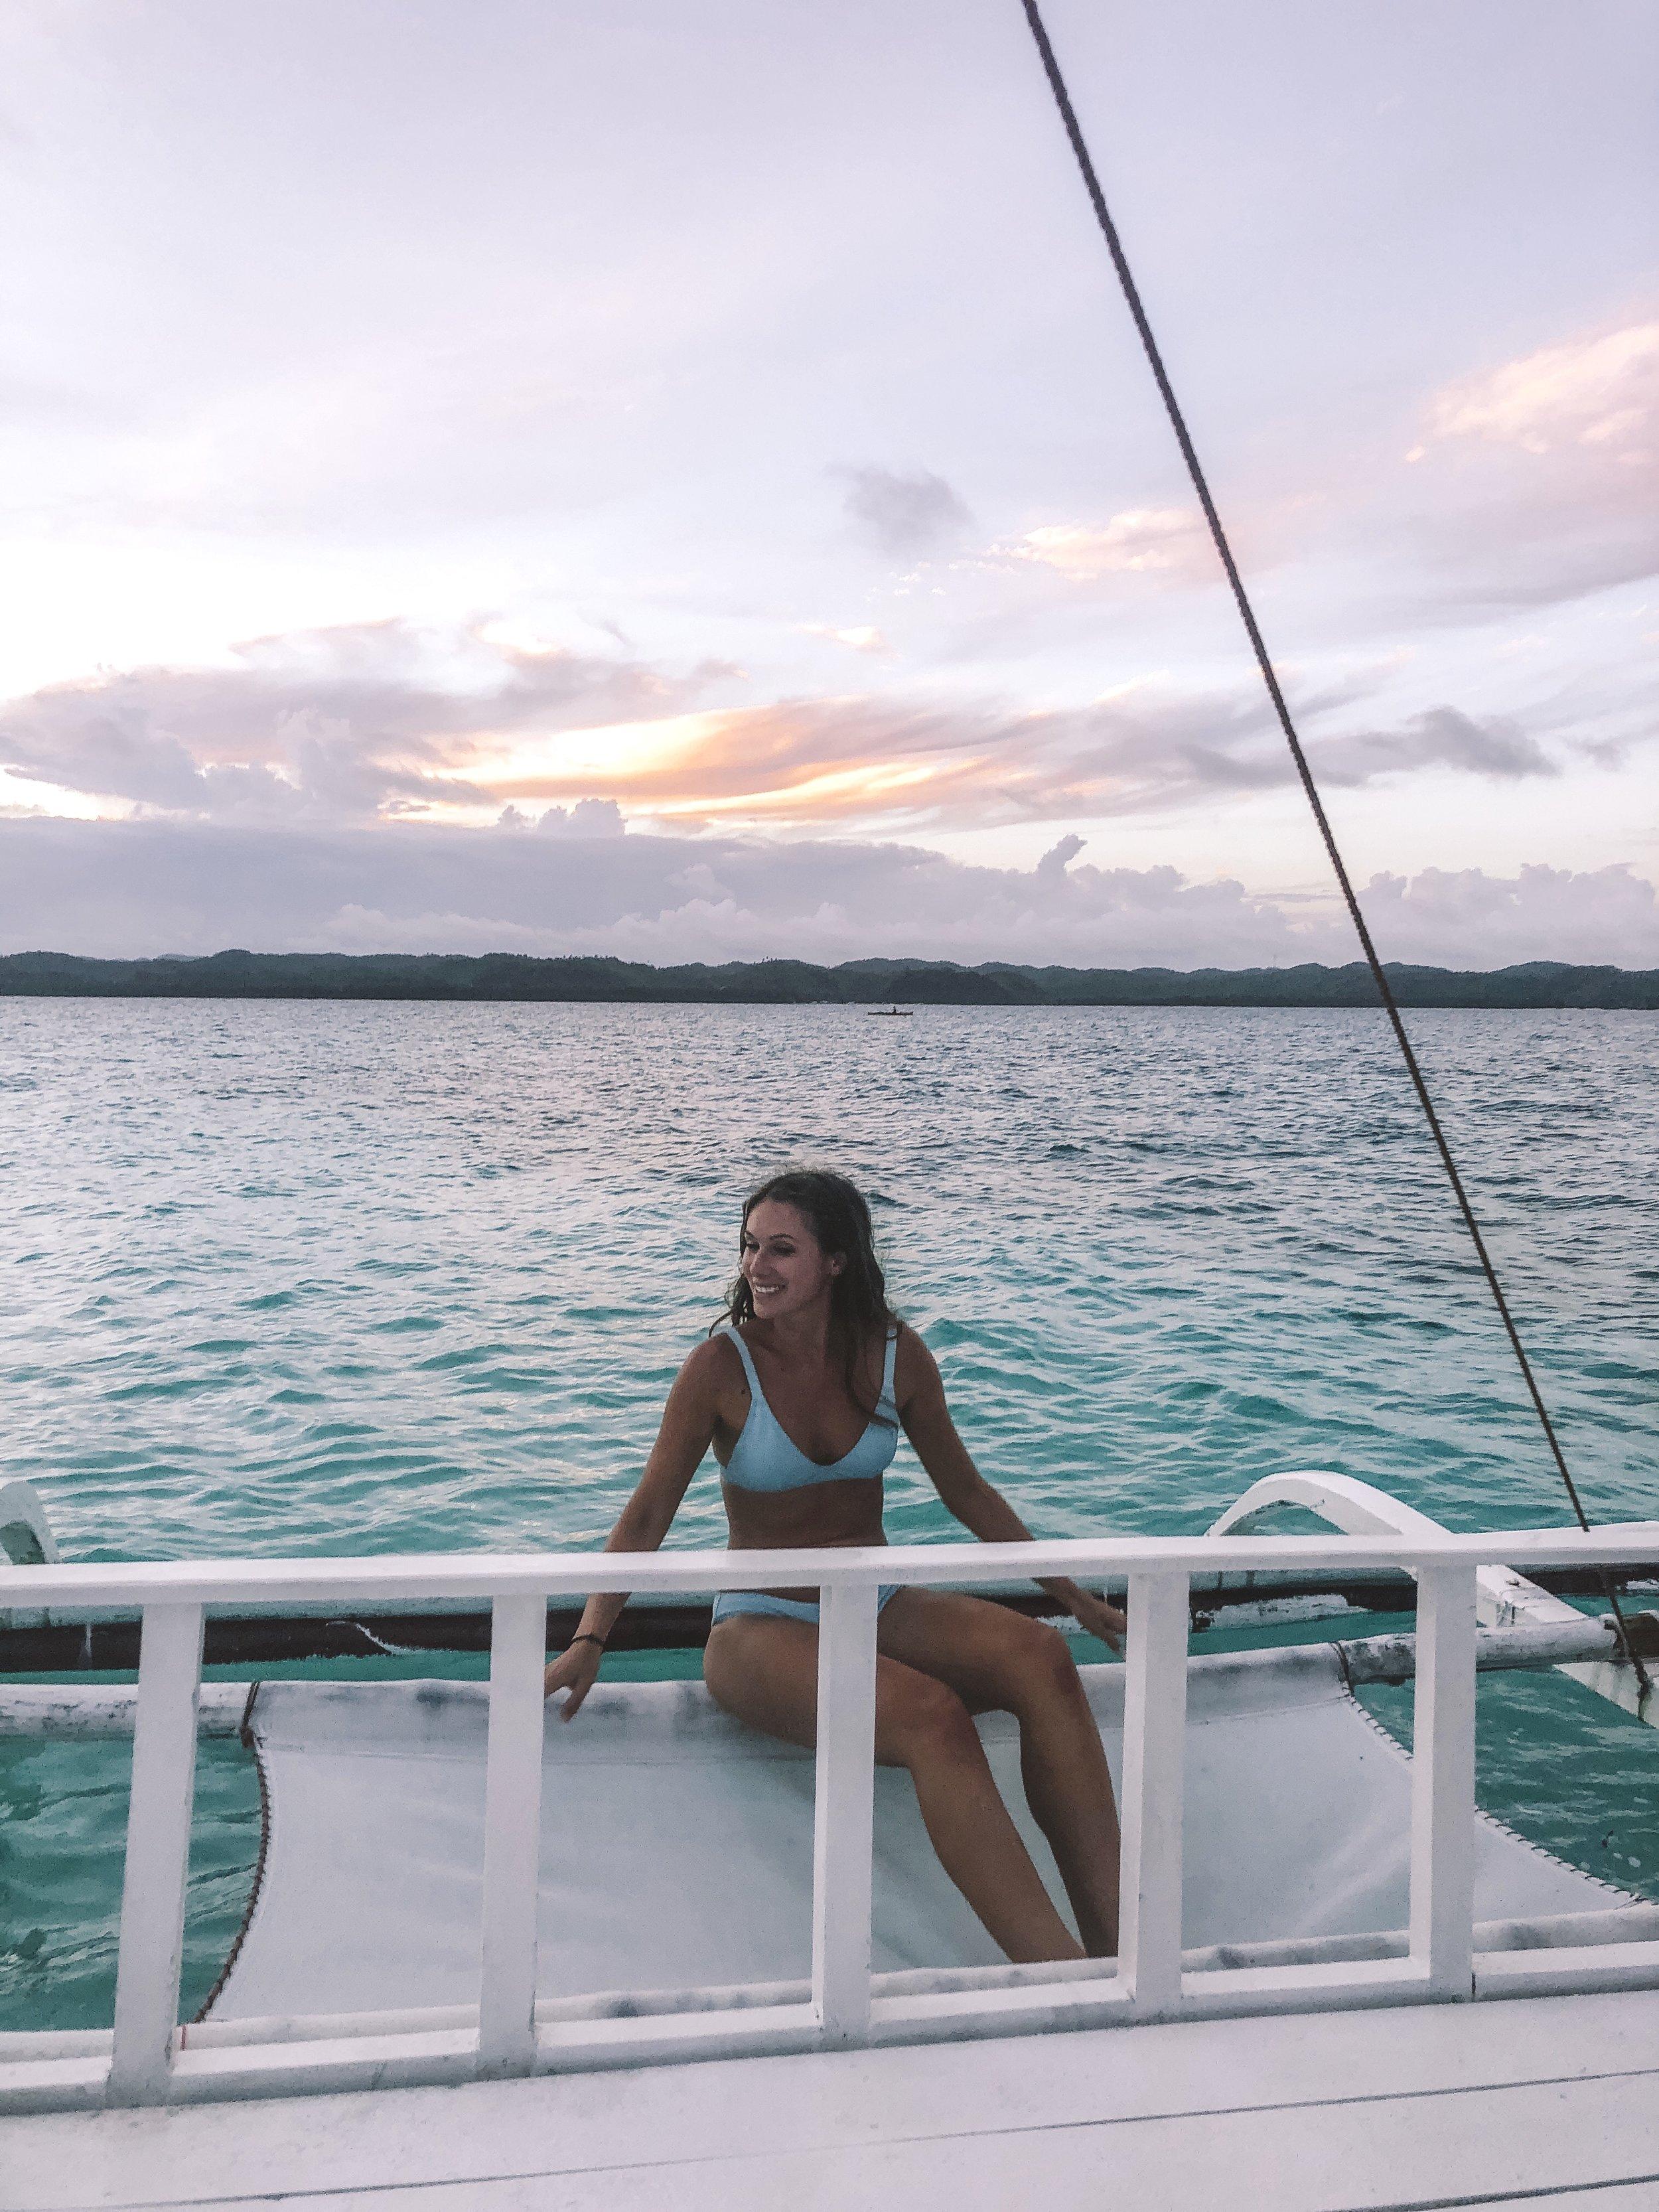 Island Hopping - Naked Island, Siargao